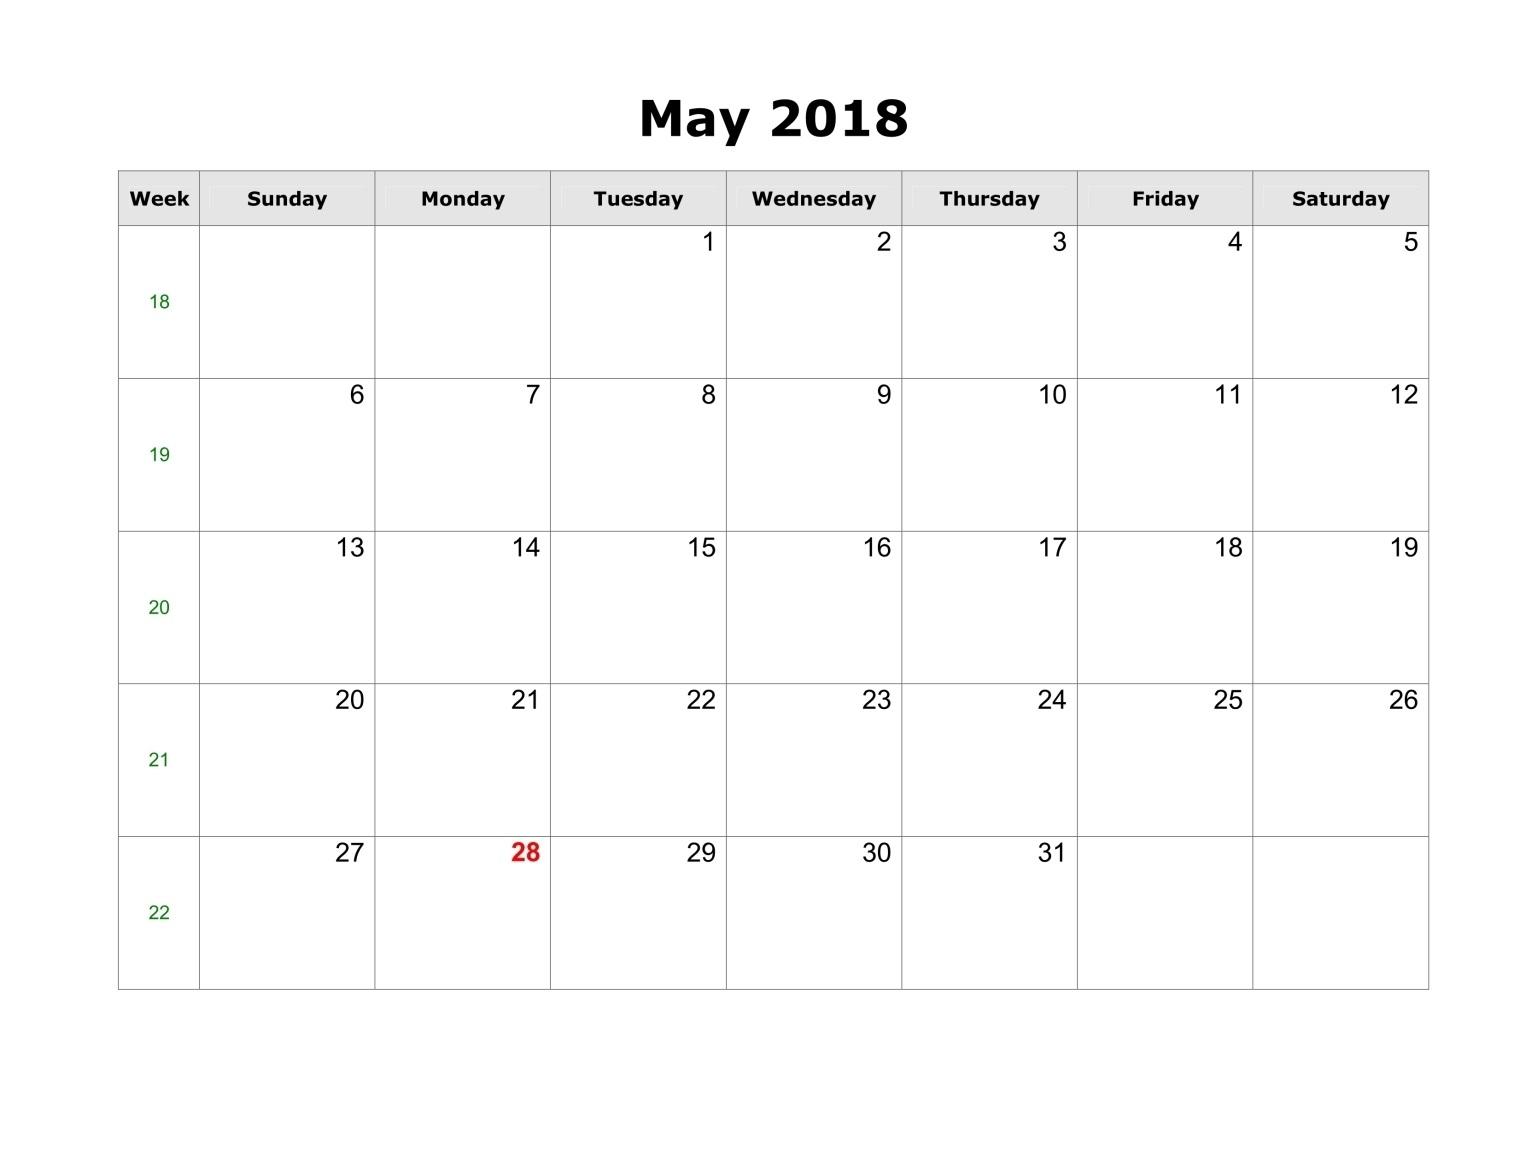 May 2018 Printable Calendar, 2018 May Calendar